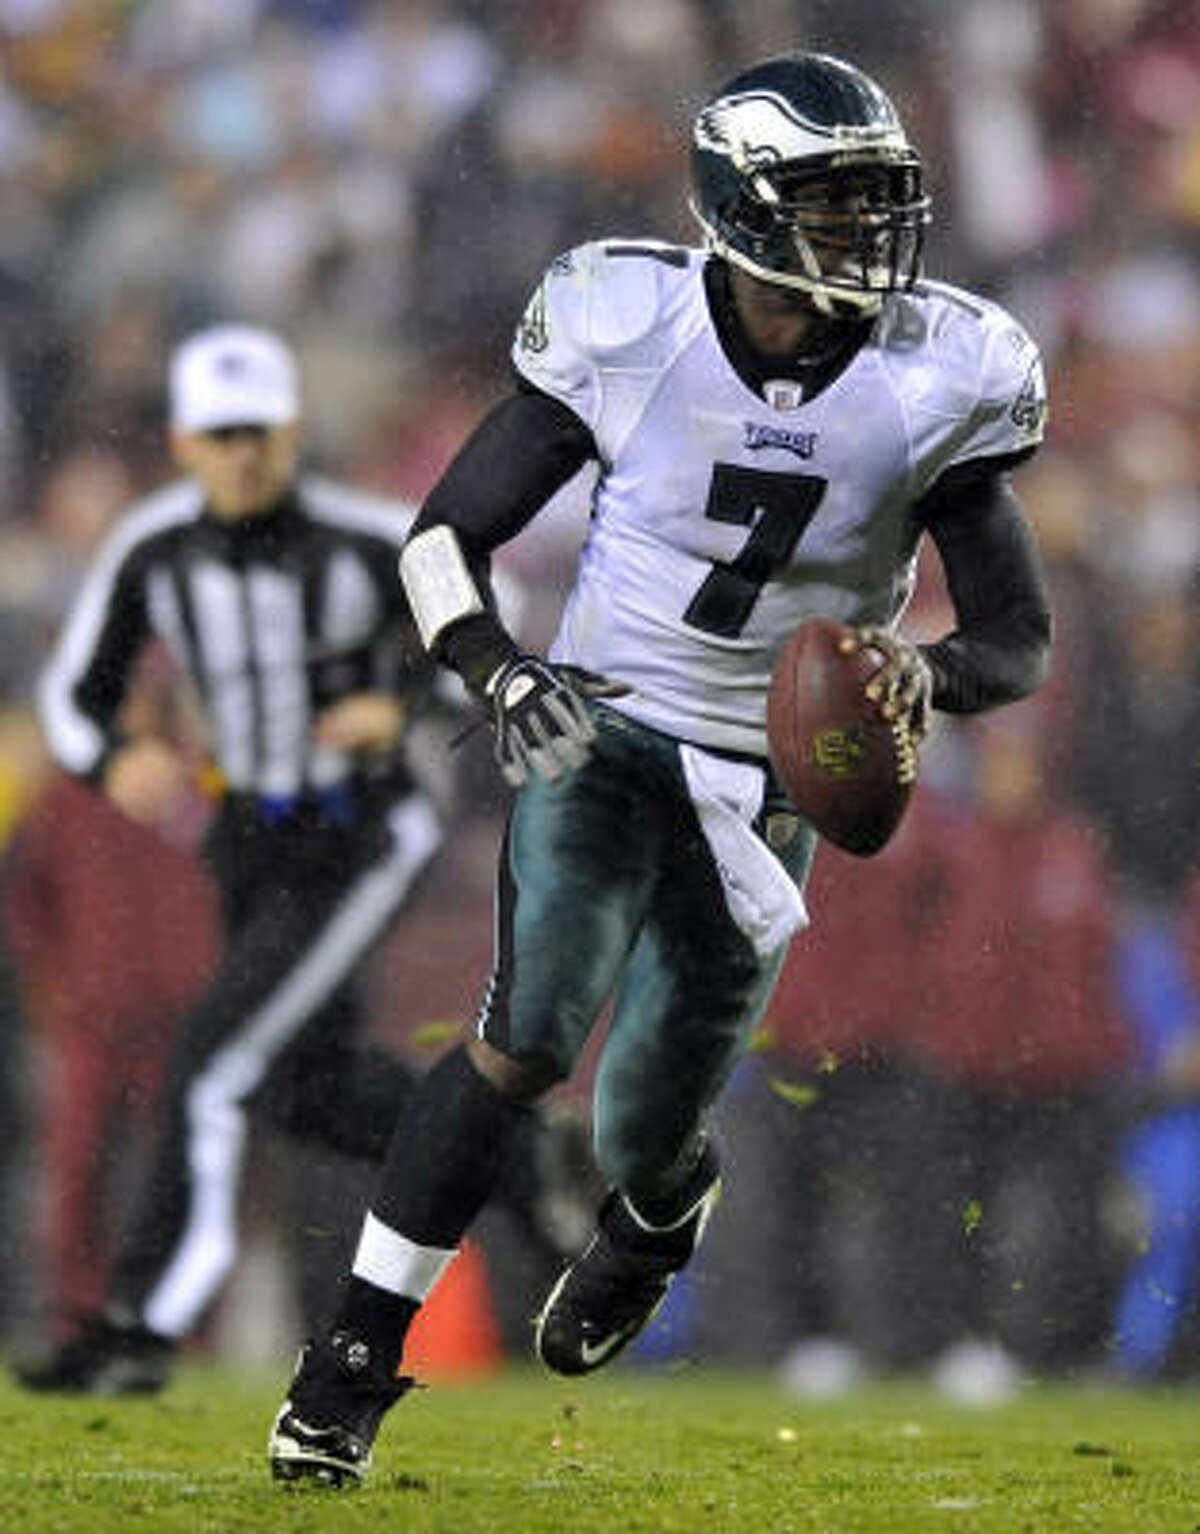 Eagles quarterback Michael Vick has thrown 11 touchdown passes and no interceptions.